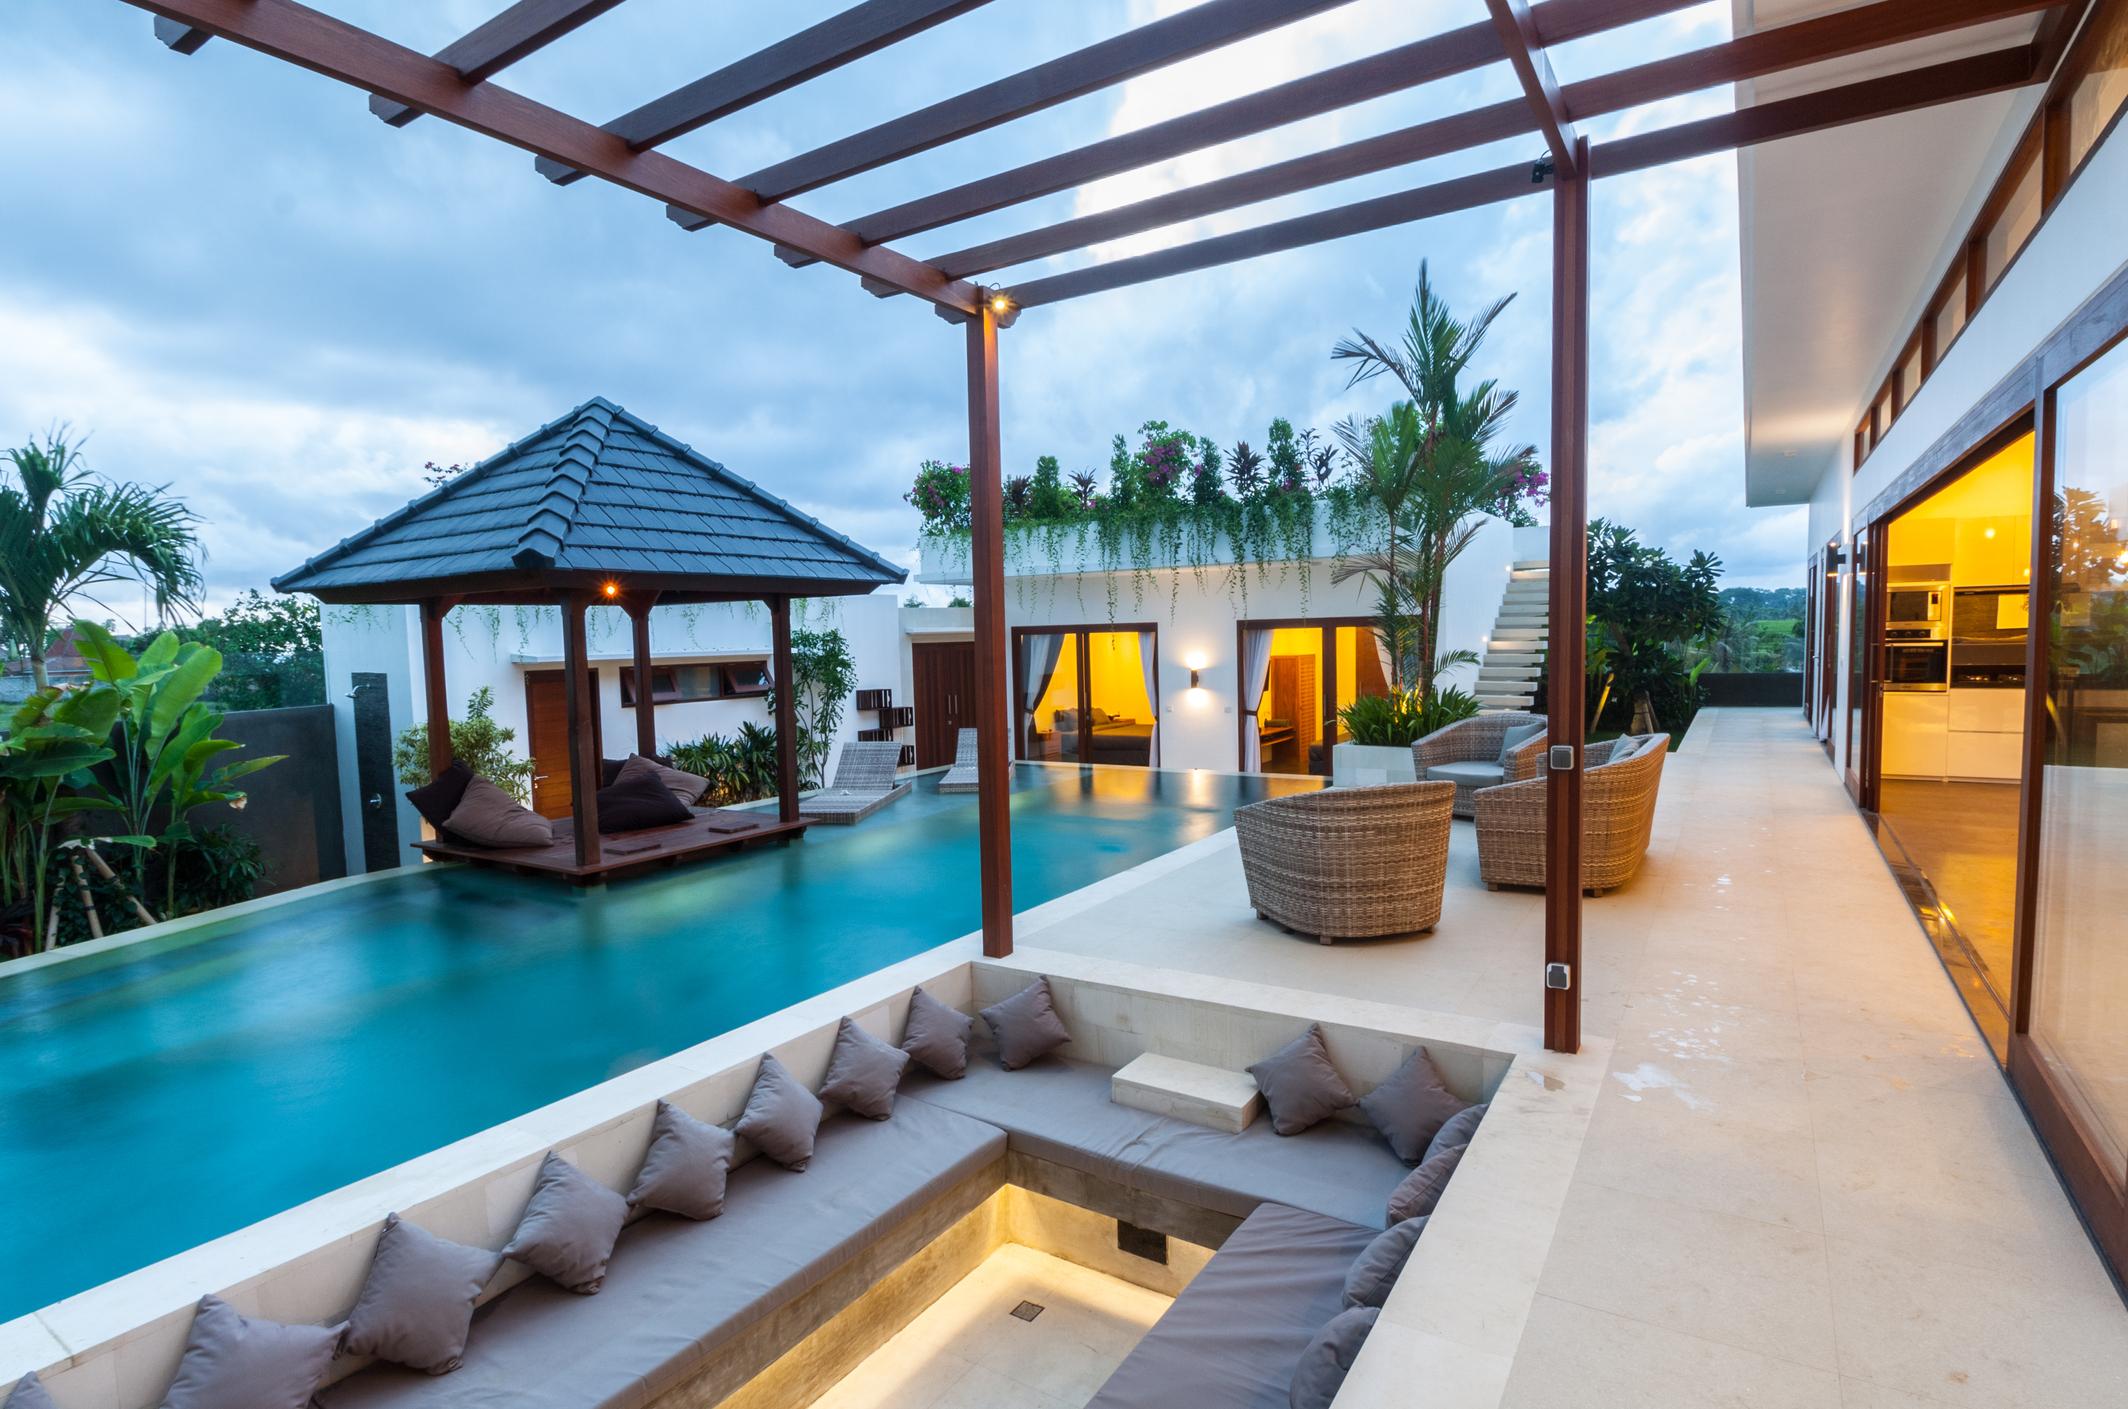 Tropical resort villa with a narrow rectangular pool